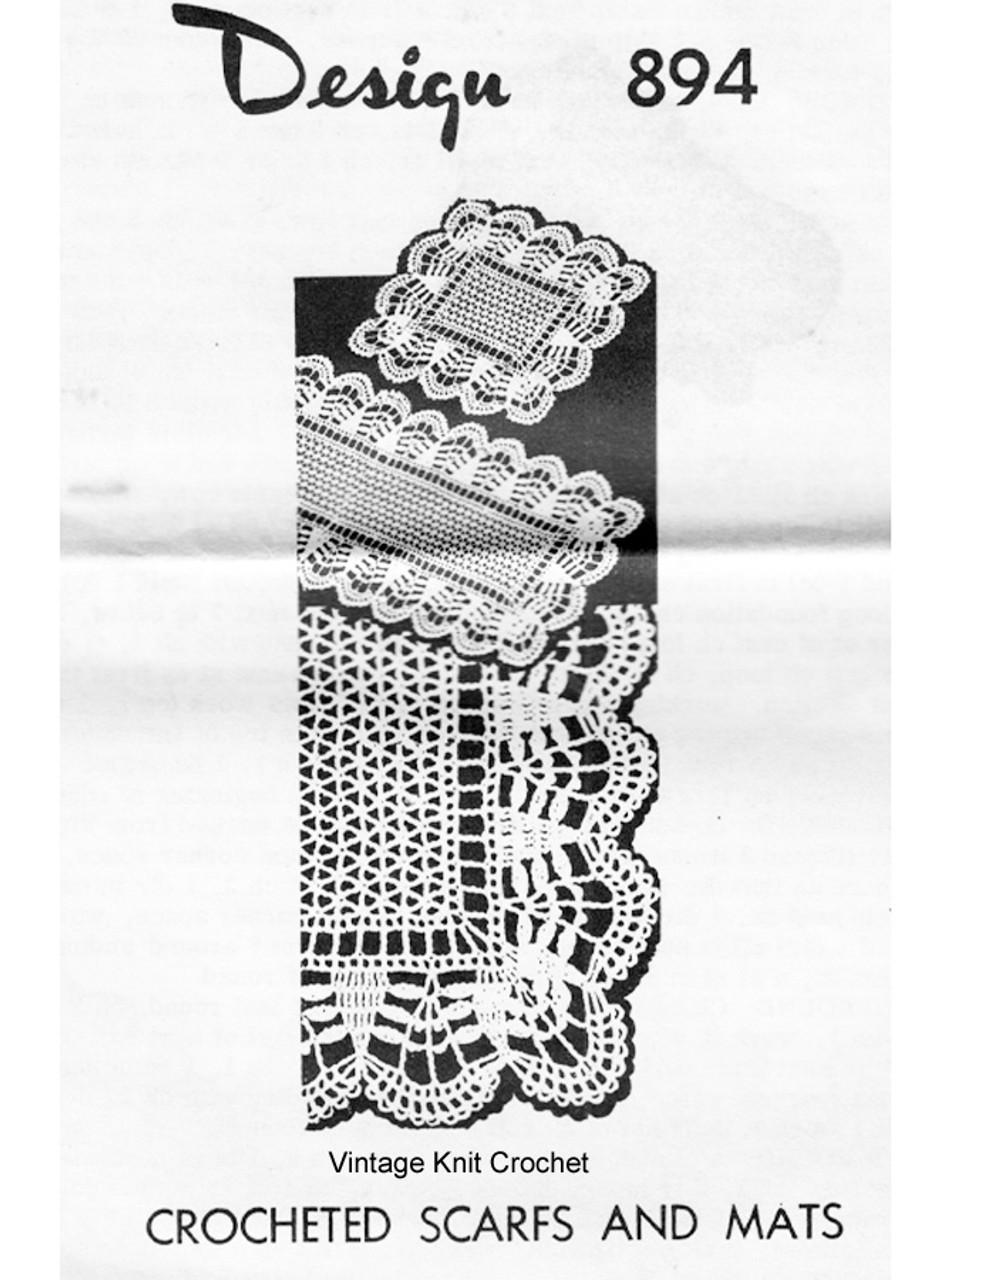 Vintage Crochet Luncheon Set Pattern, Mail Order Design 894